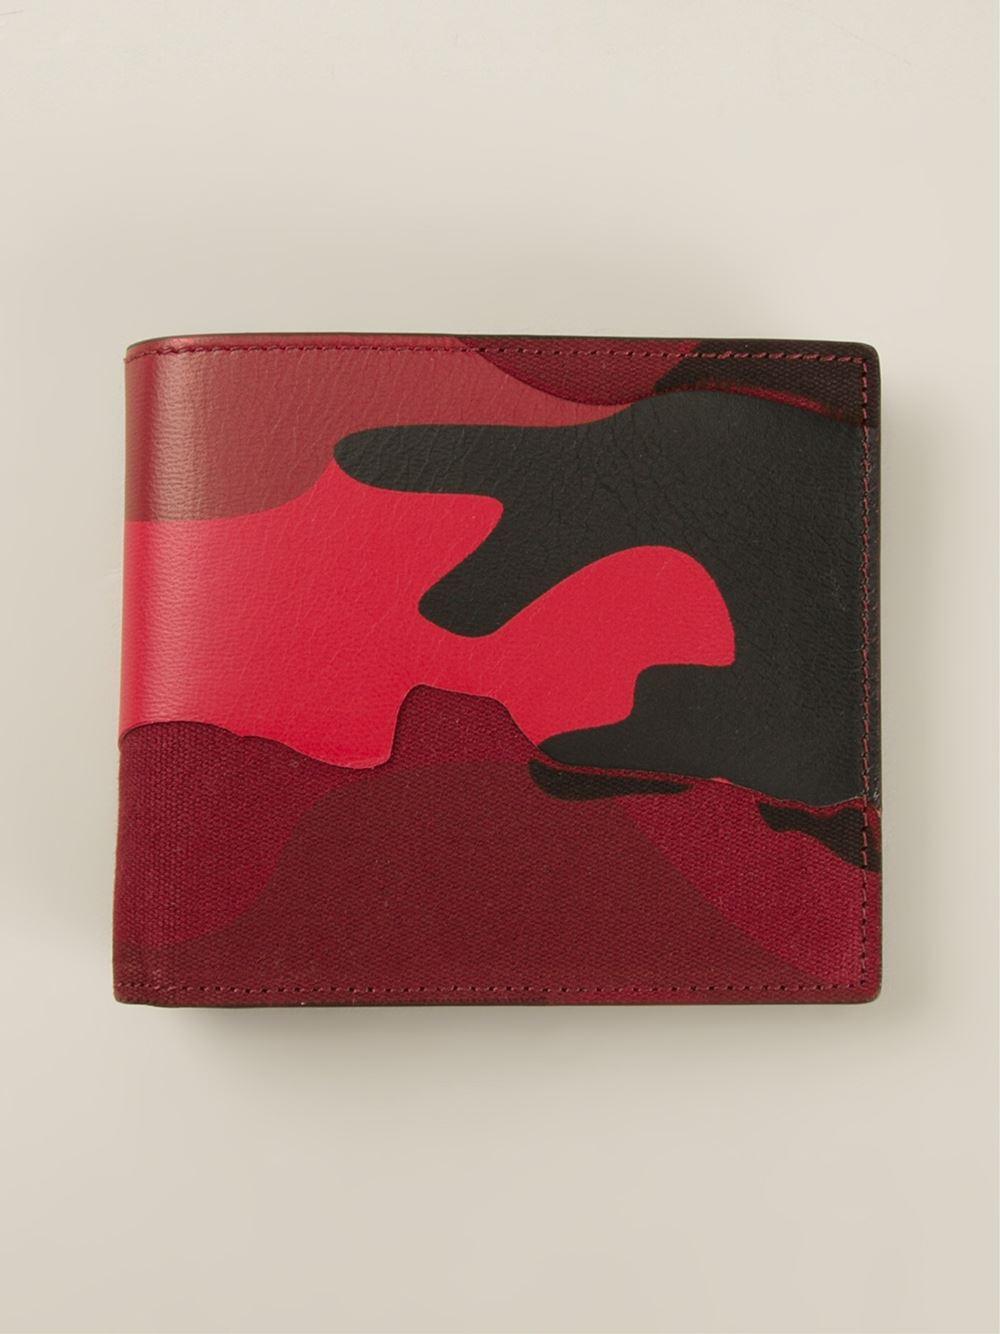 dcdda7f10c83 Valentino Black Camouflage Wallet for men